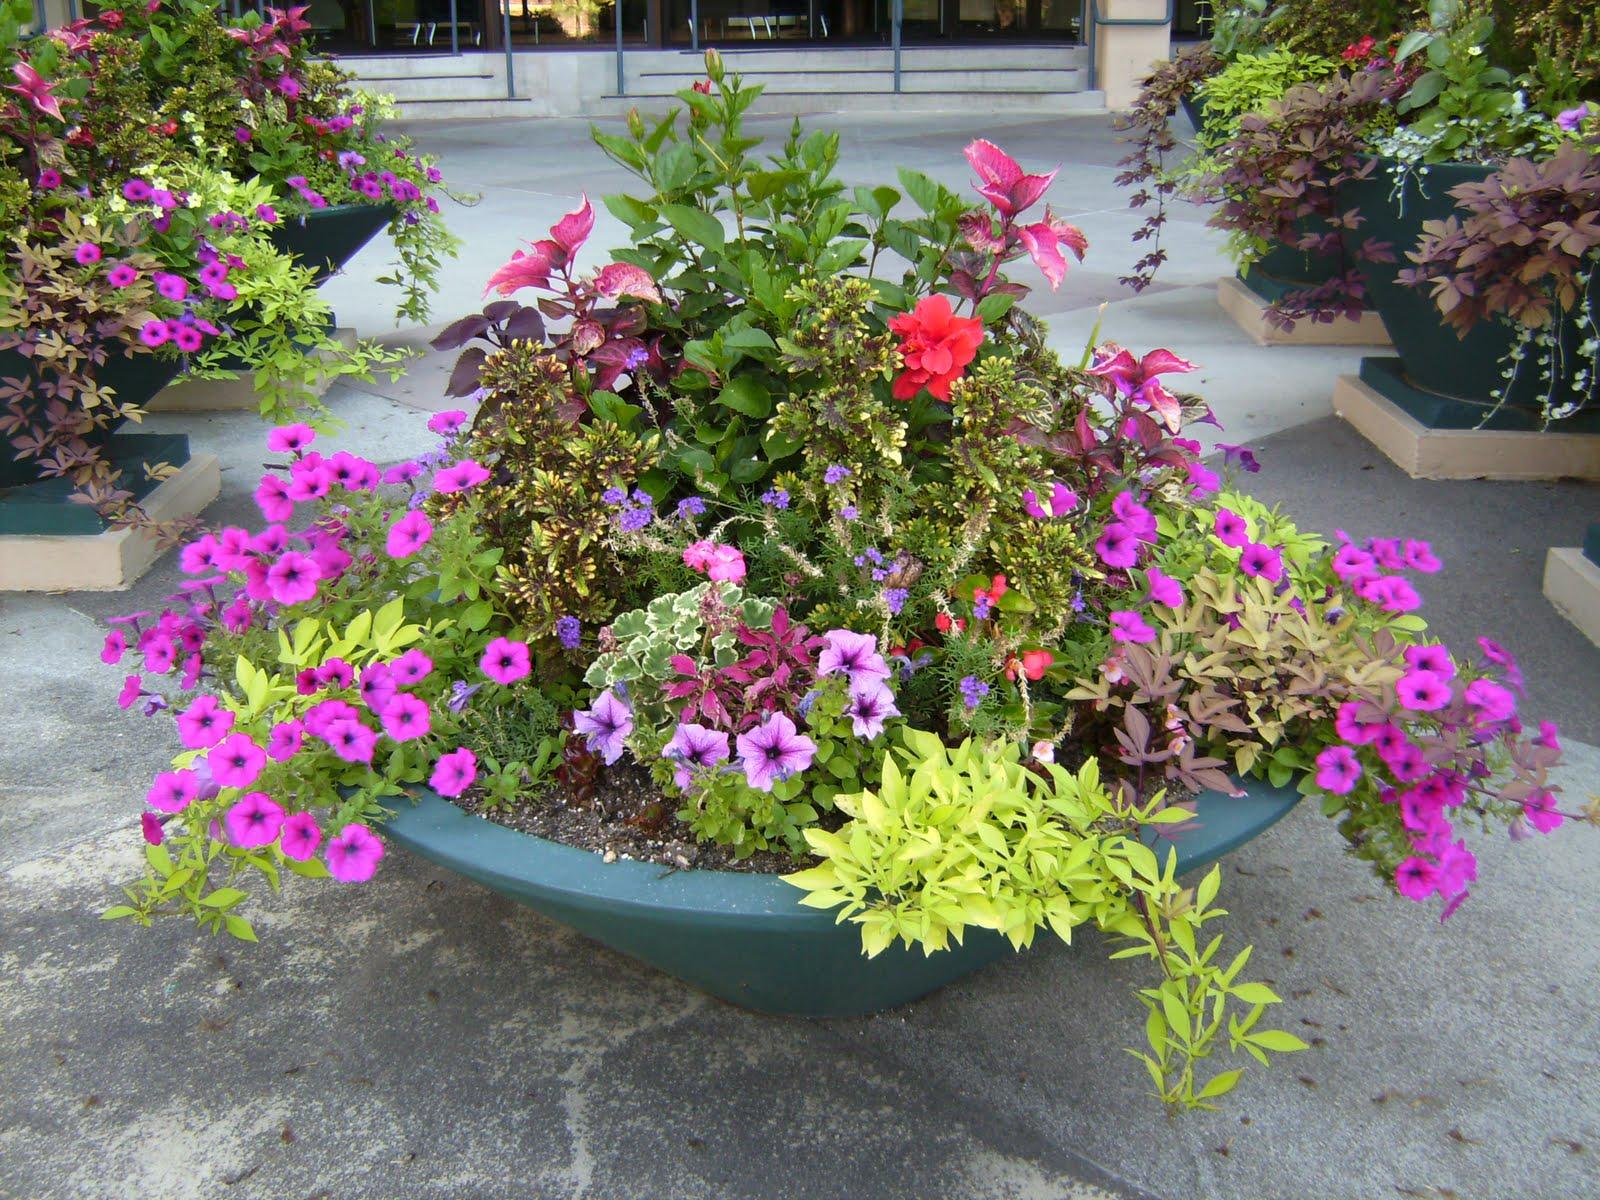 Garden Designers Roundtable: Containers | Garden Share Bristol